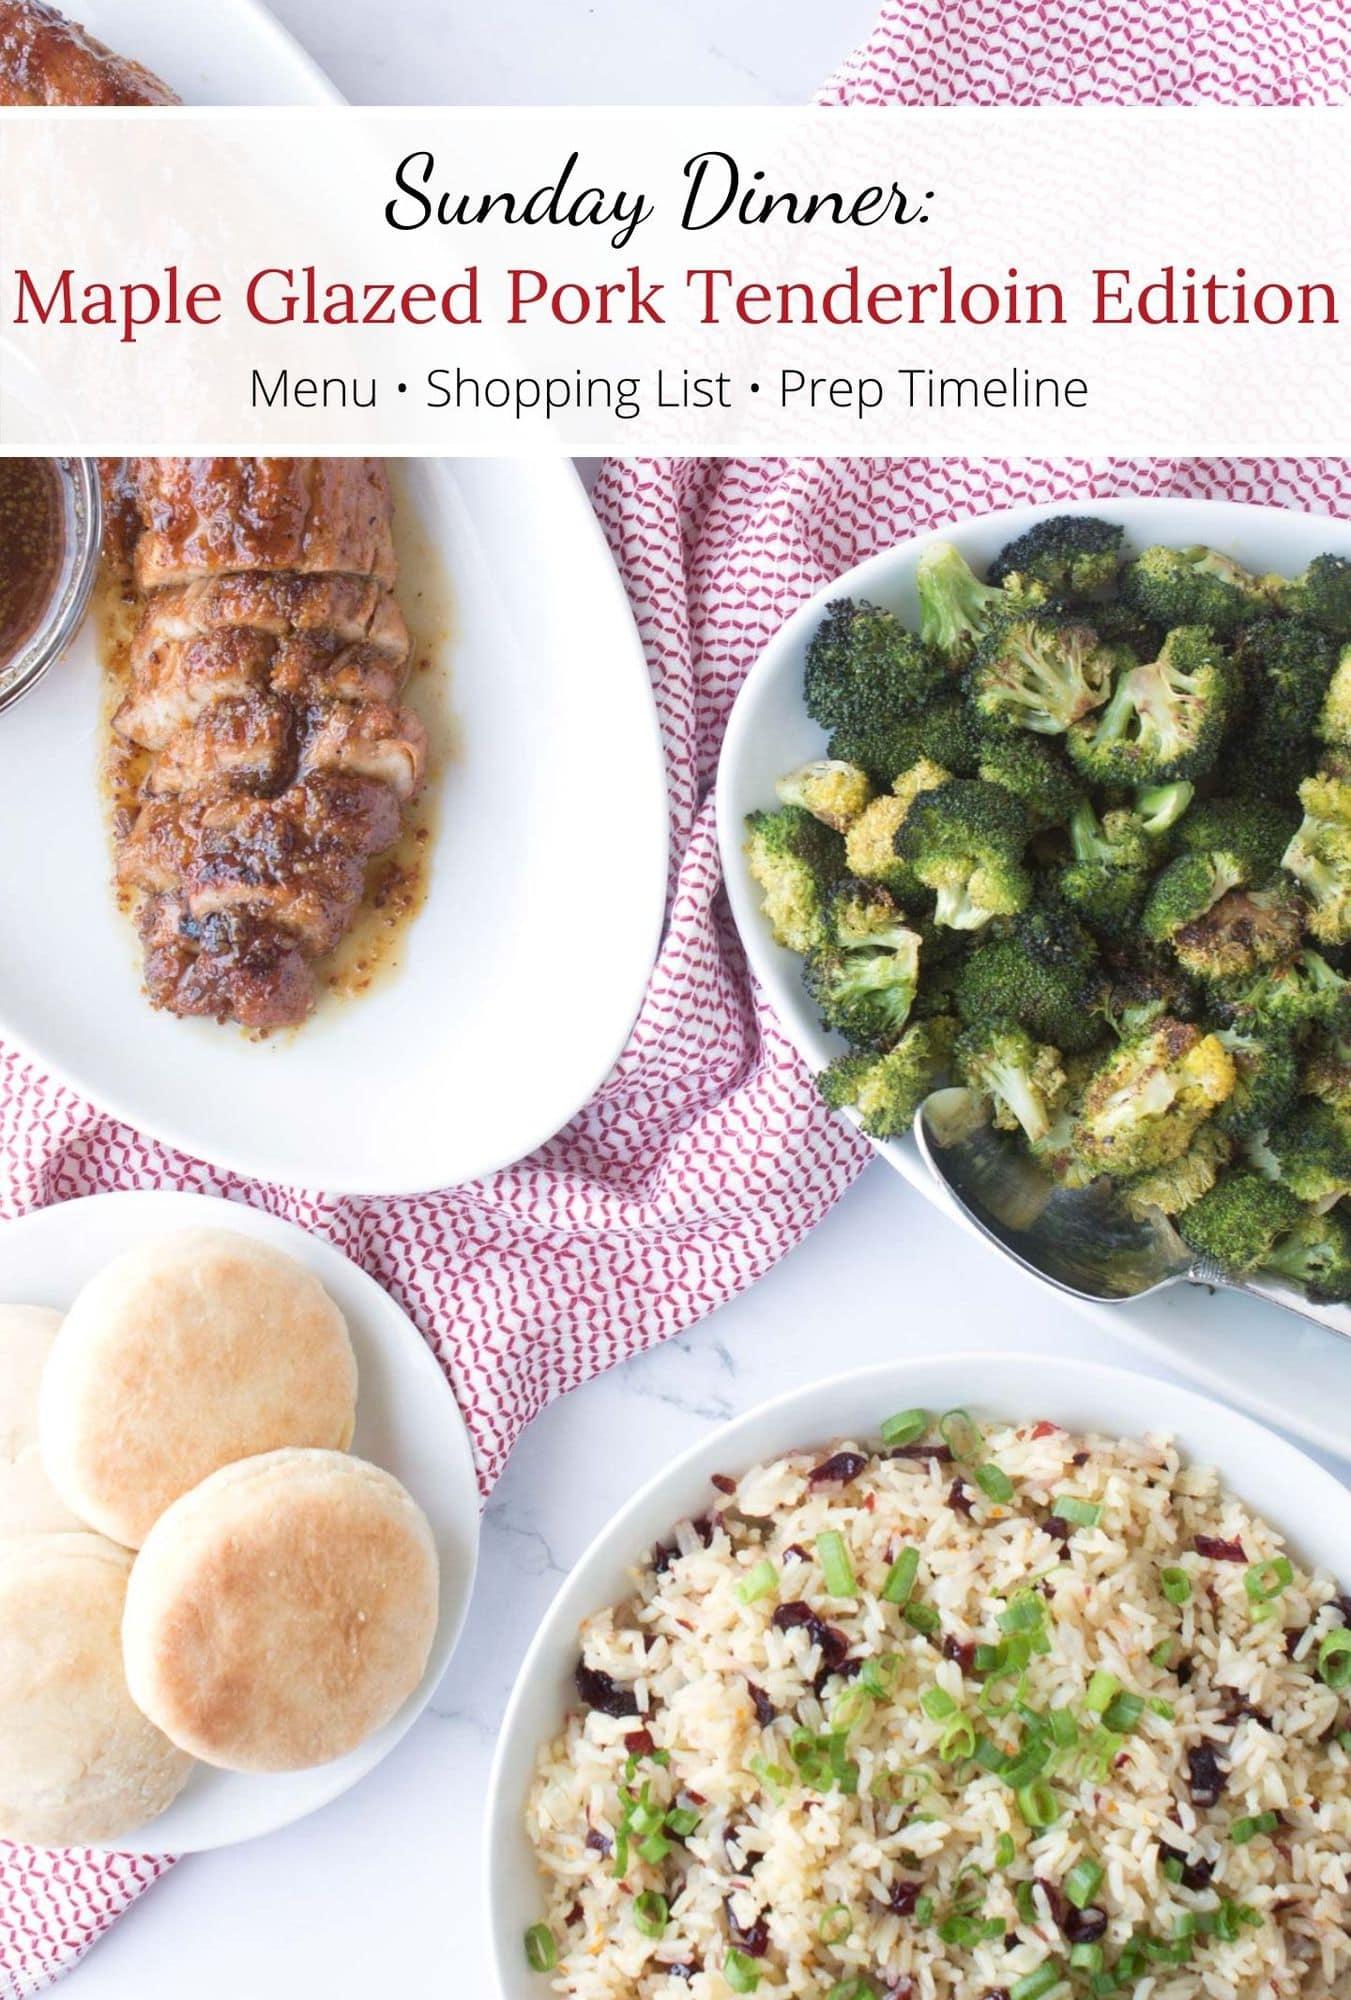 Maple Glazed Pork Tenderloin Edition Sunday Dinner menu with graphic overlay.